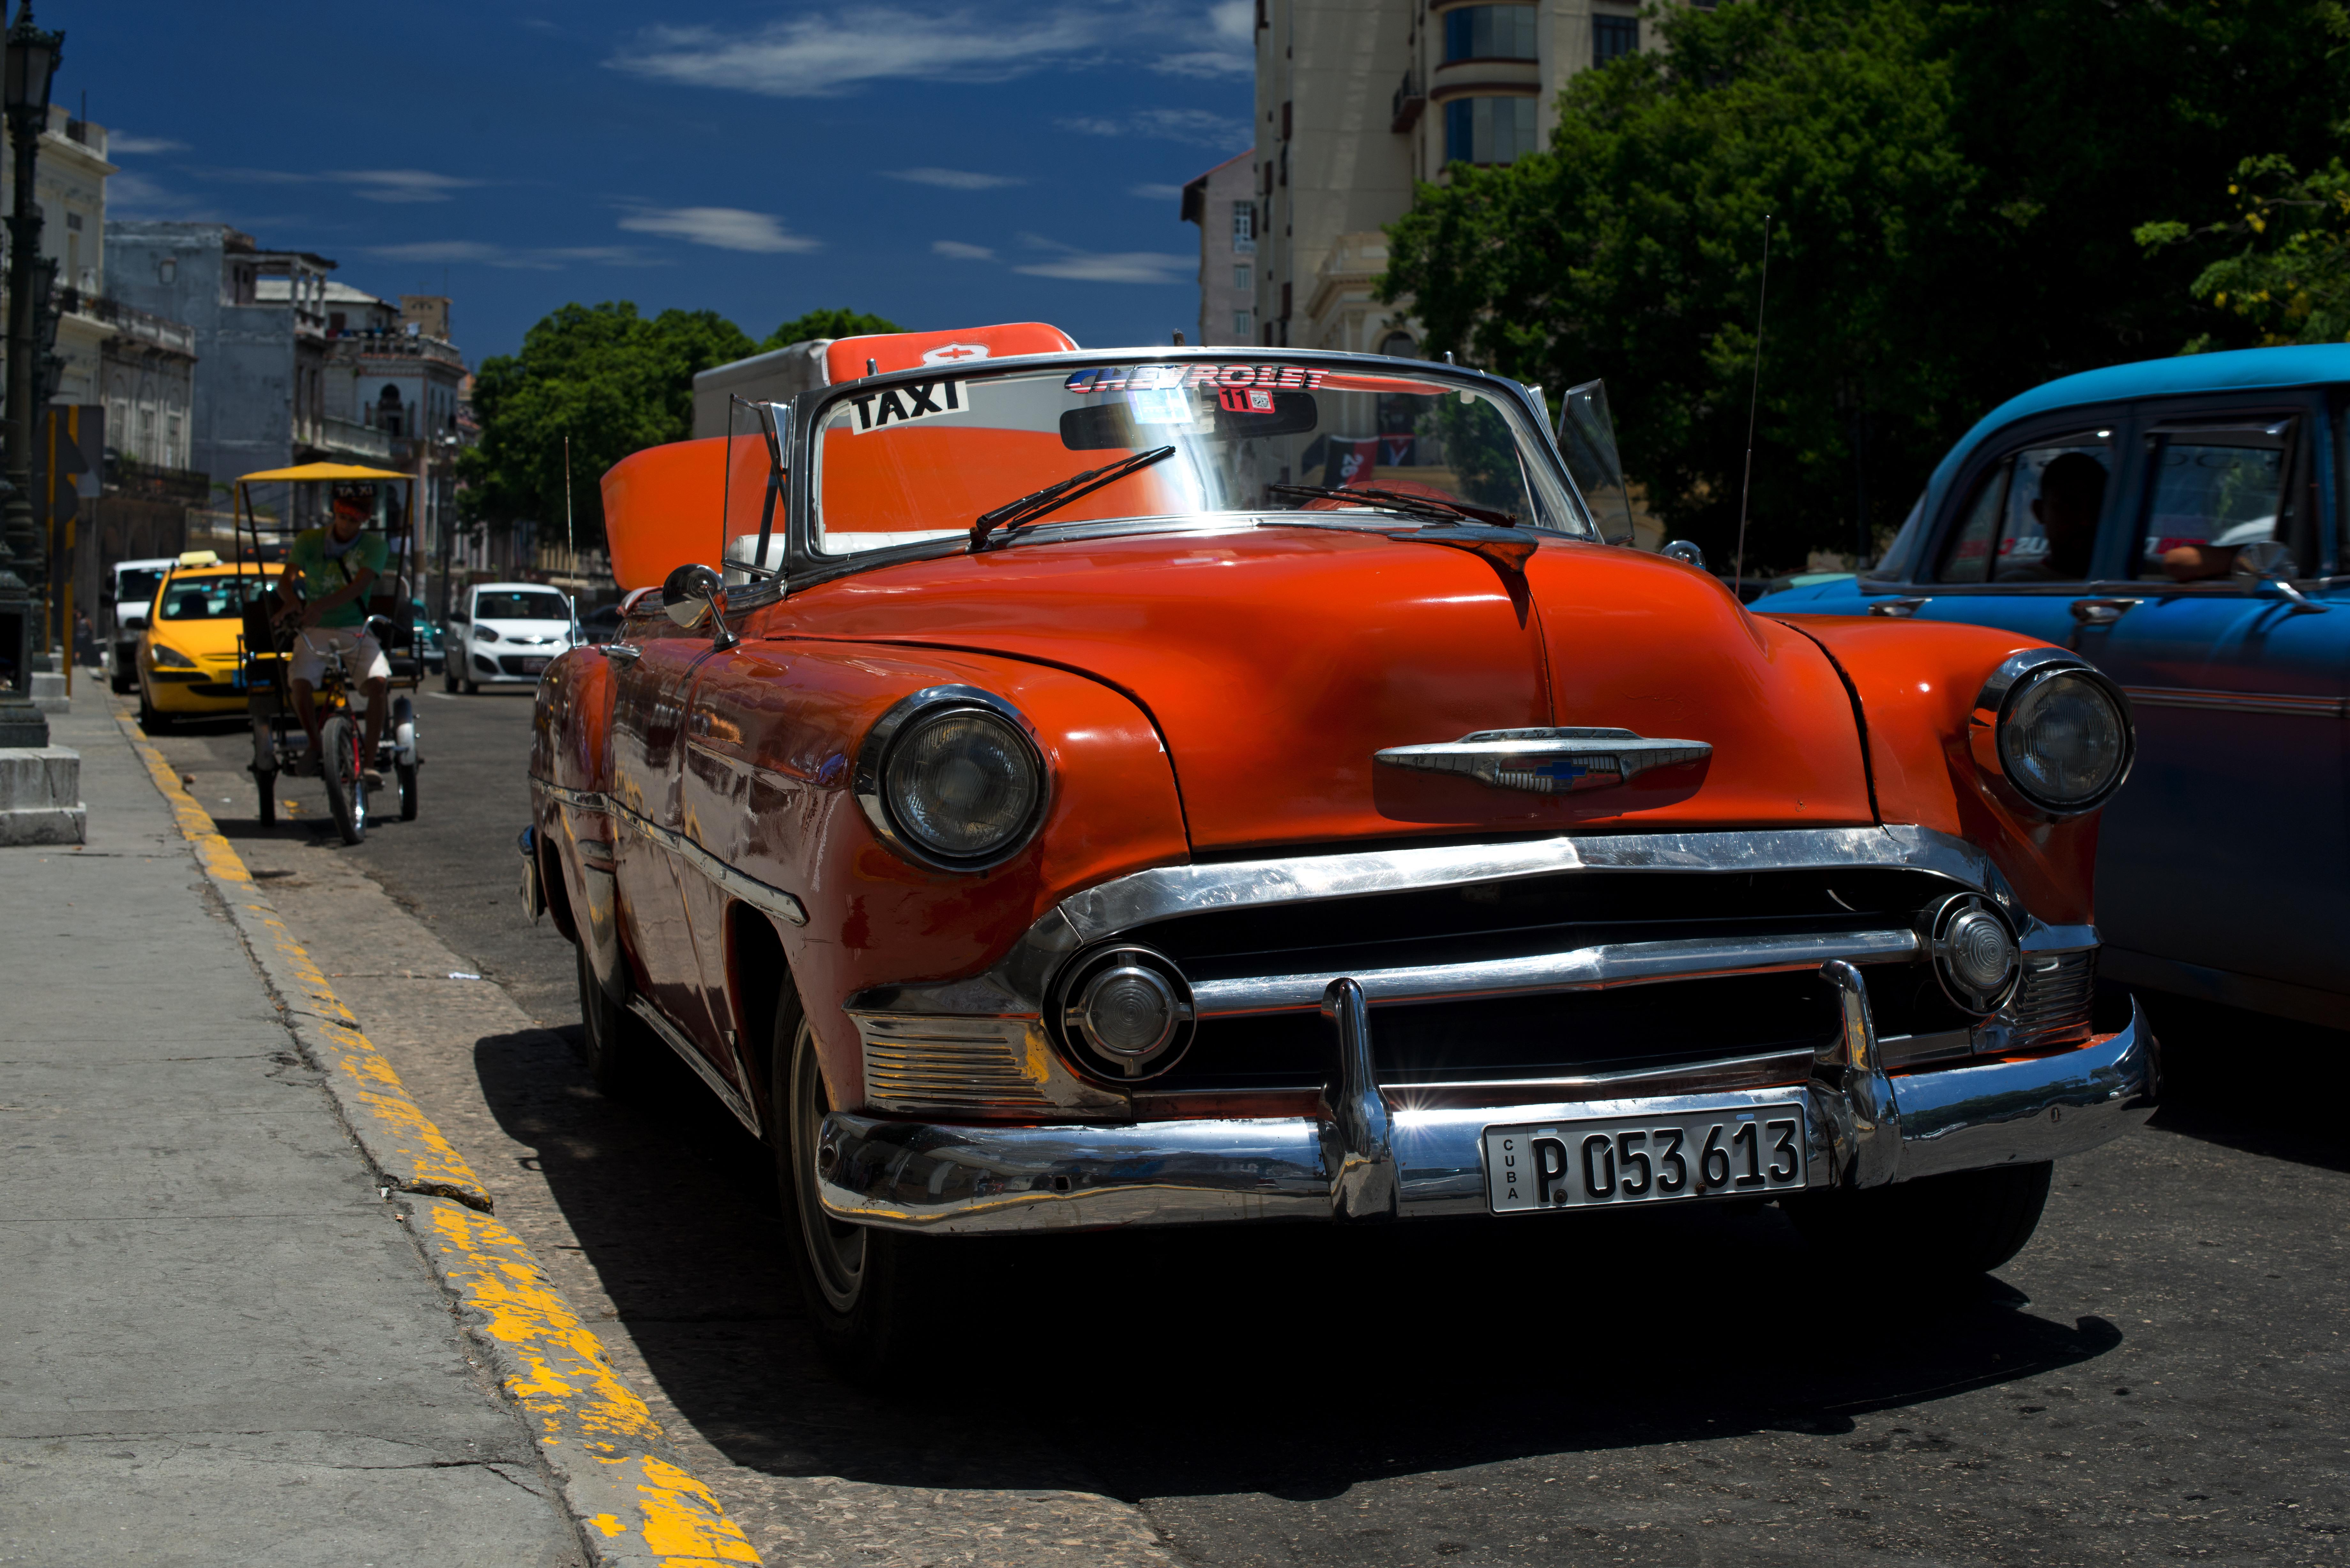 Habana_taxi_inglaterra_2_2821Habana_taxi_inglaterra_2low